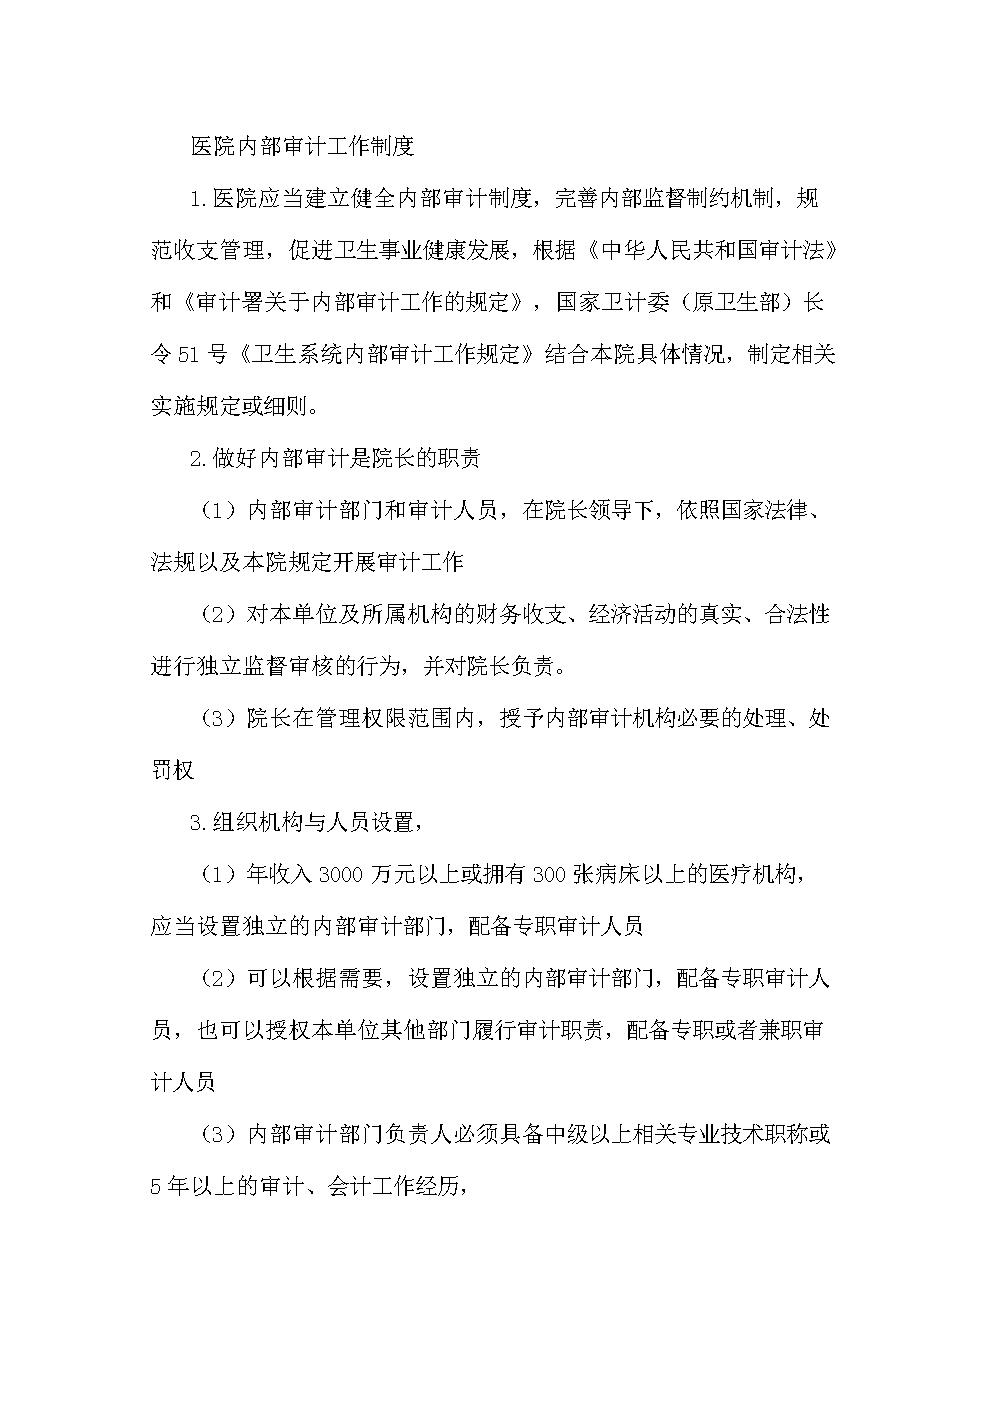 XX医院内部审计工作制度.docx